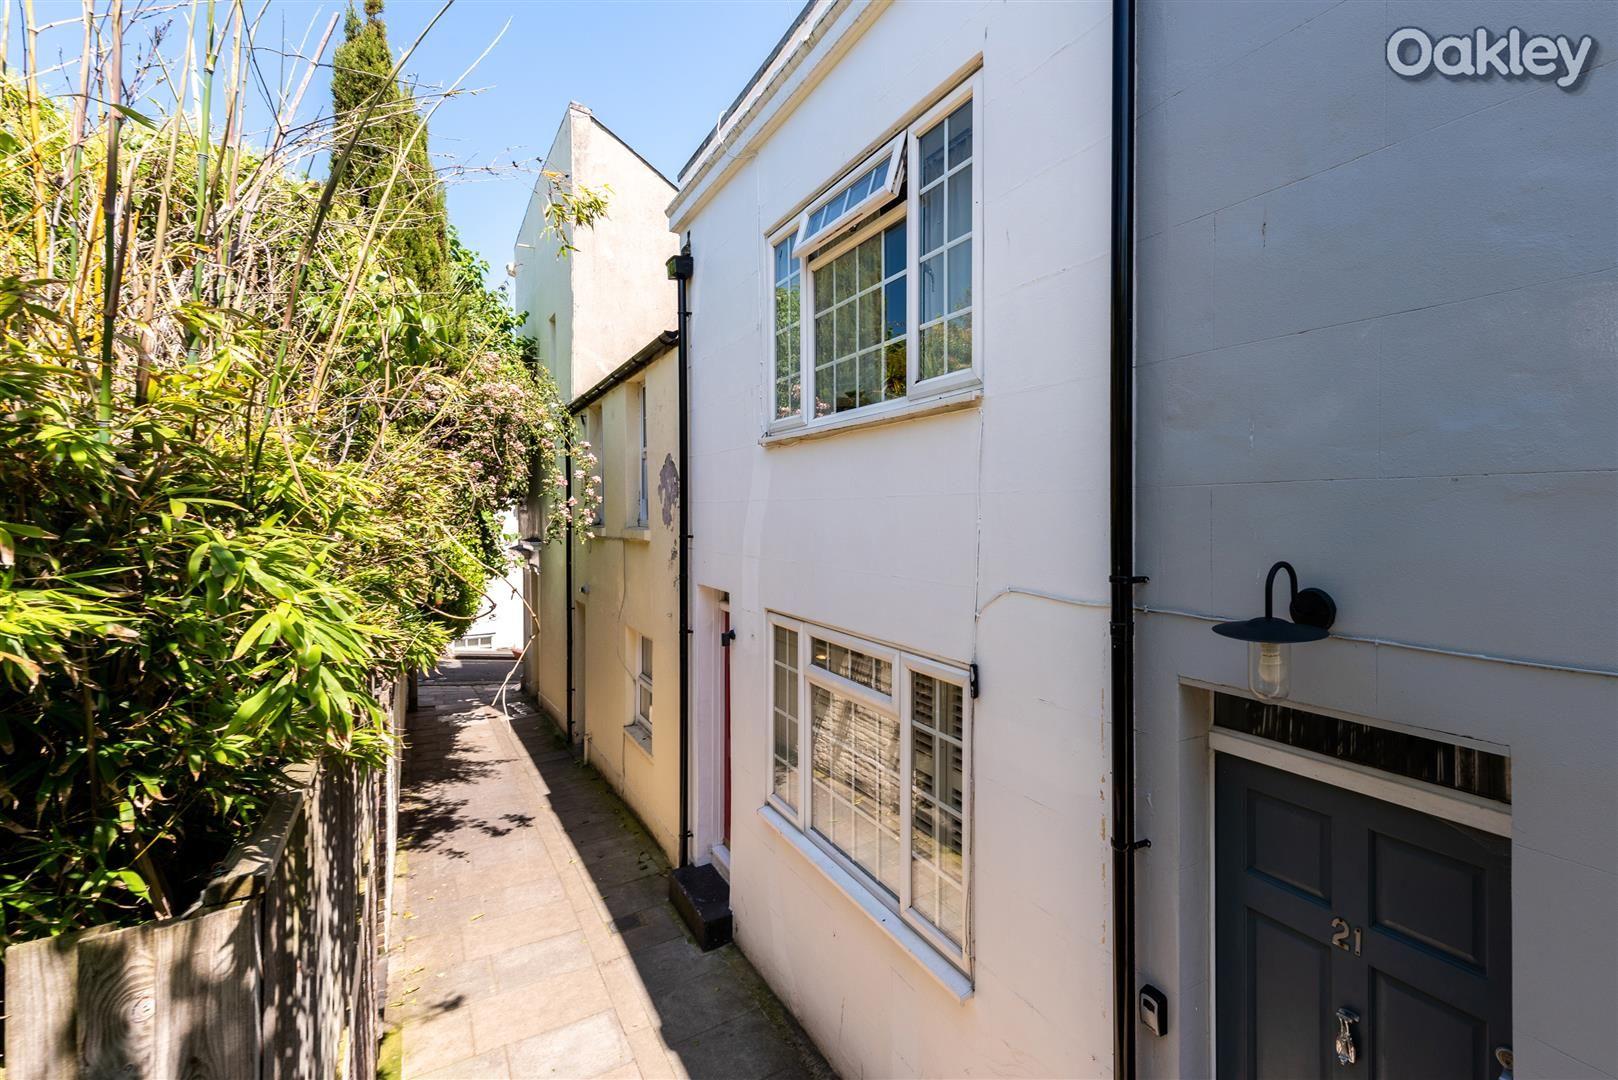 Property photo 1 of 13. Exterior